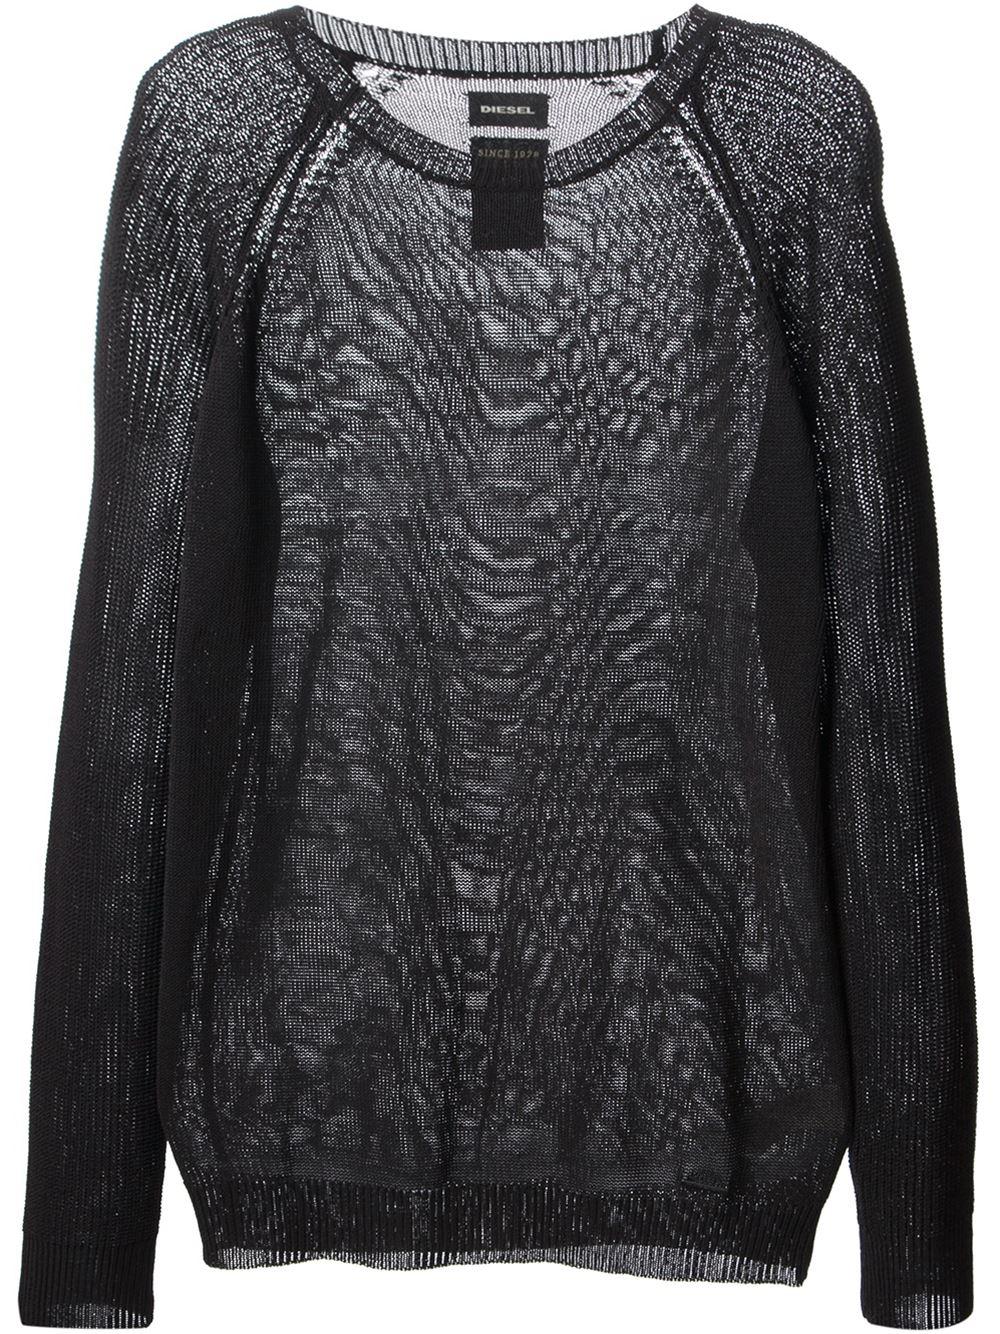 Diesel Sheer Woven Sweater in Black for Men | Lyst